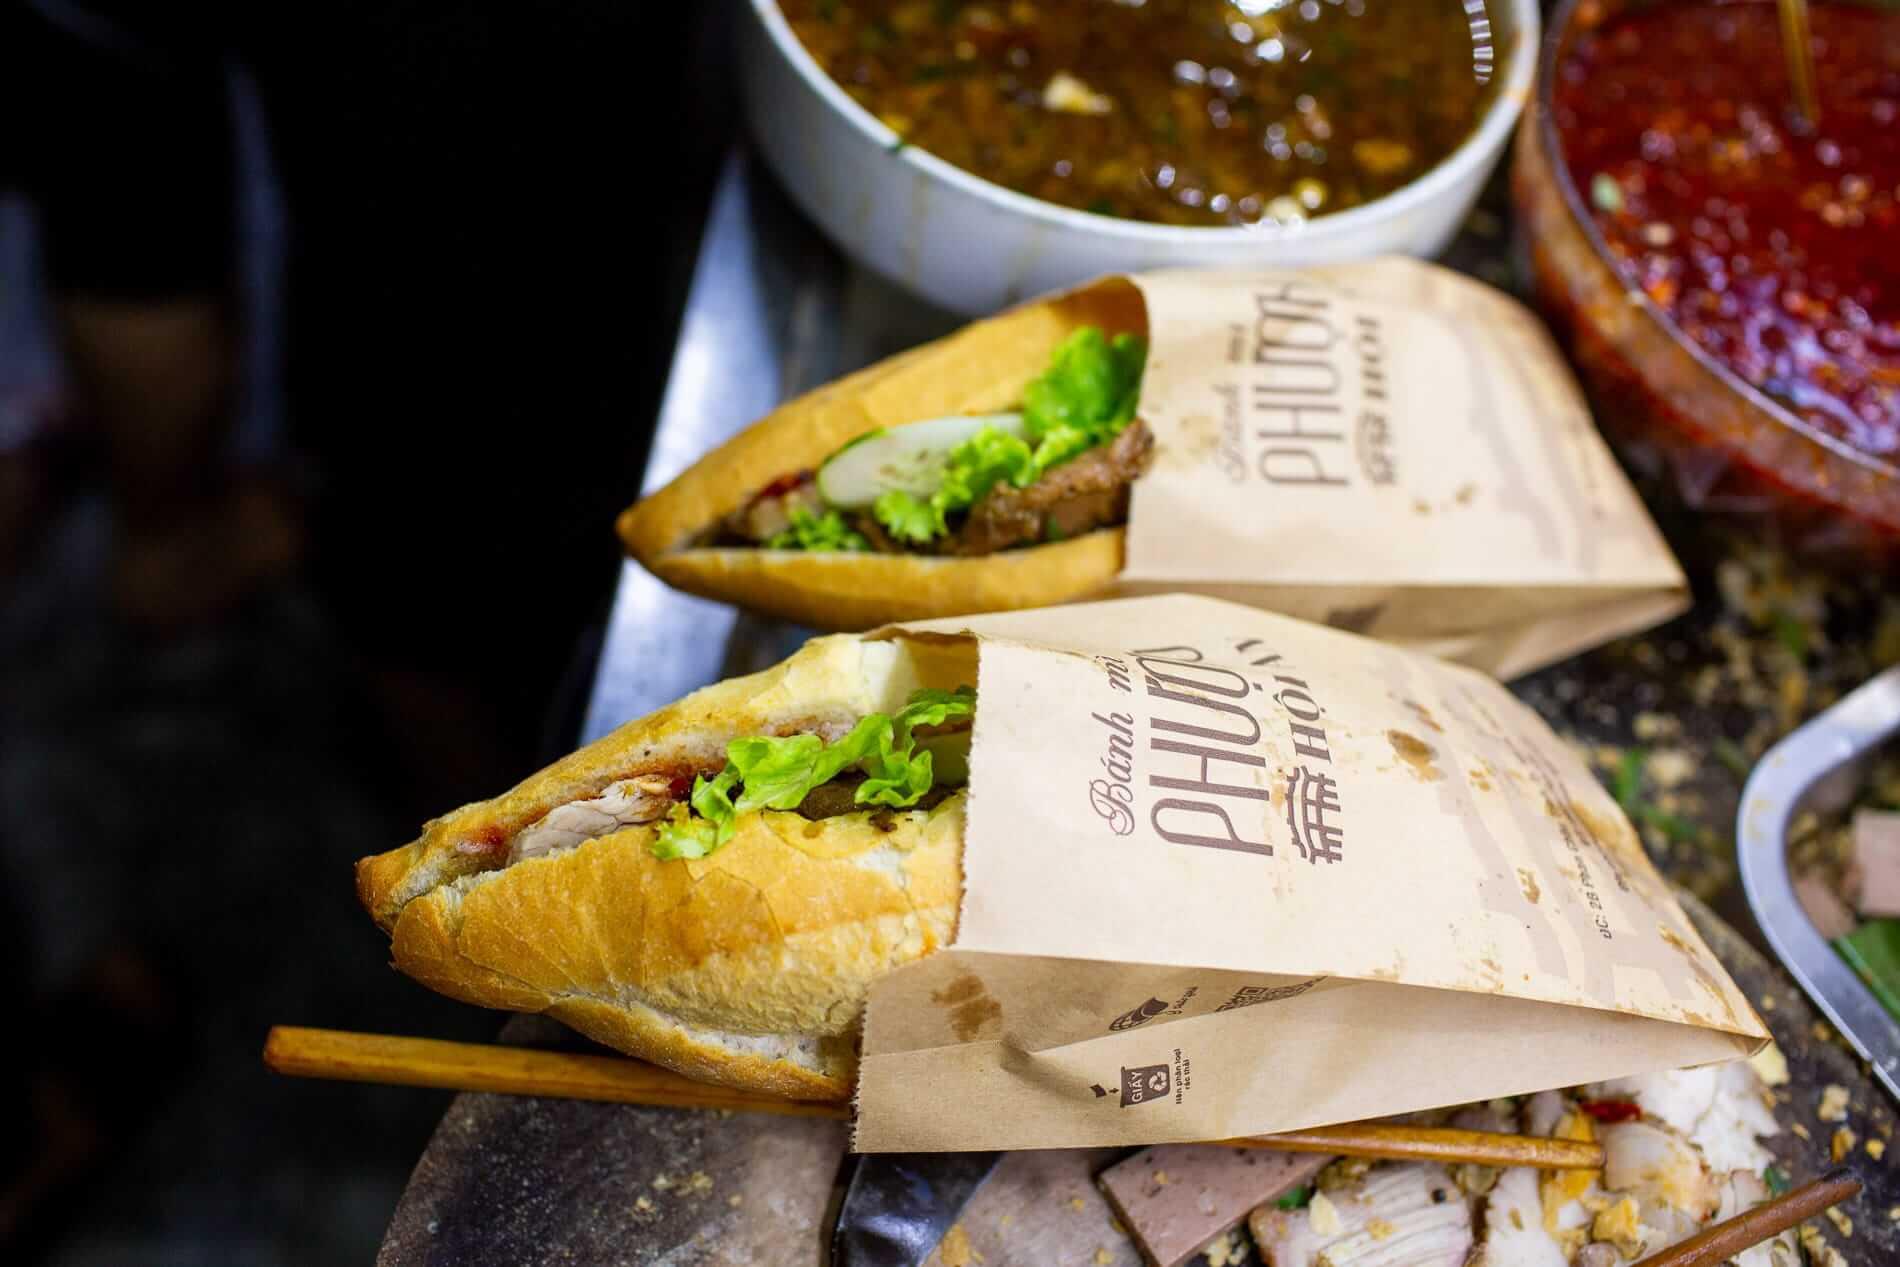 The famous Banh Mi Phuong sandwich